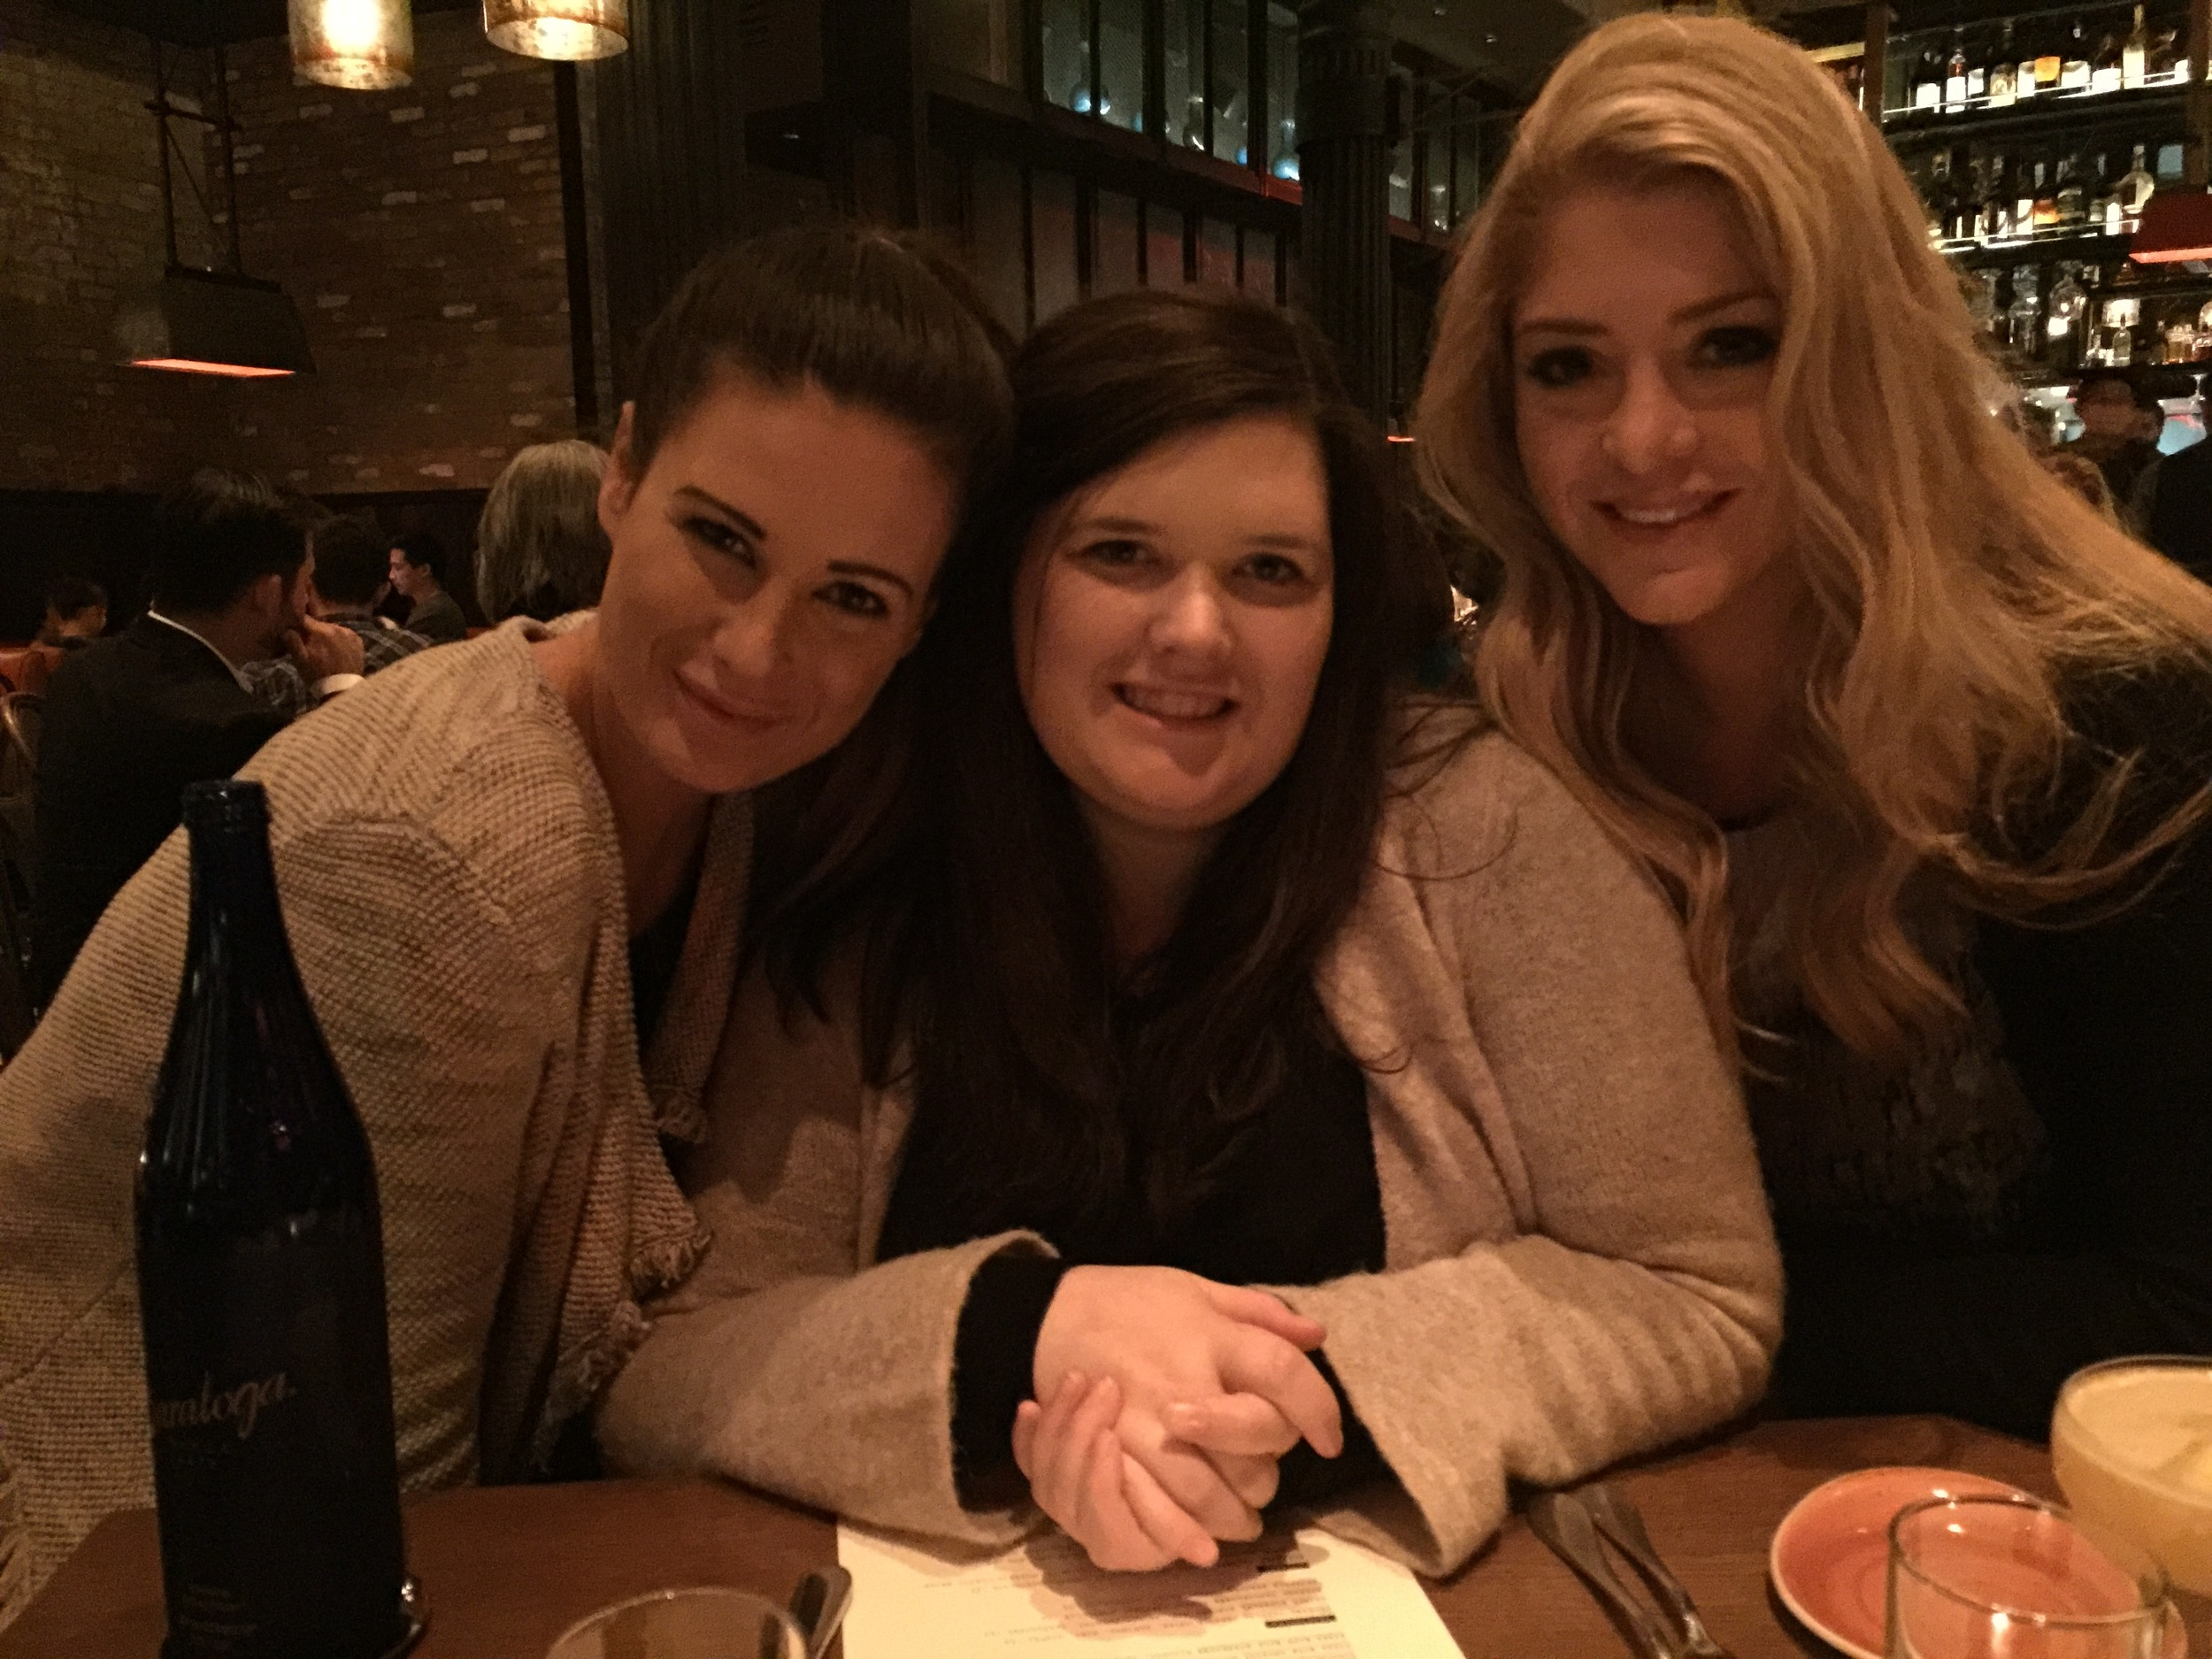 Kara, Ella and Morgan. iPhone photo by Teresa Leonard.